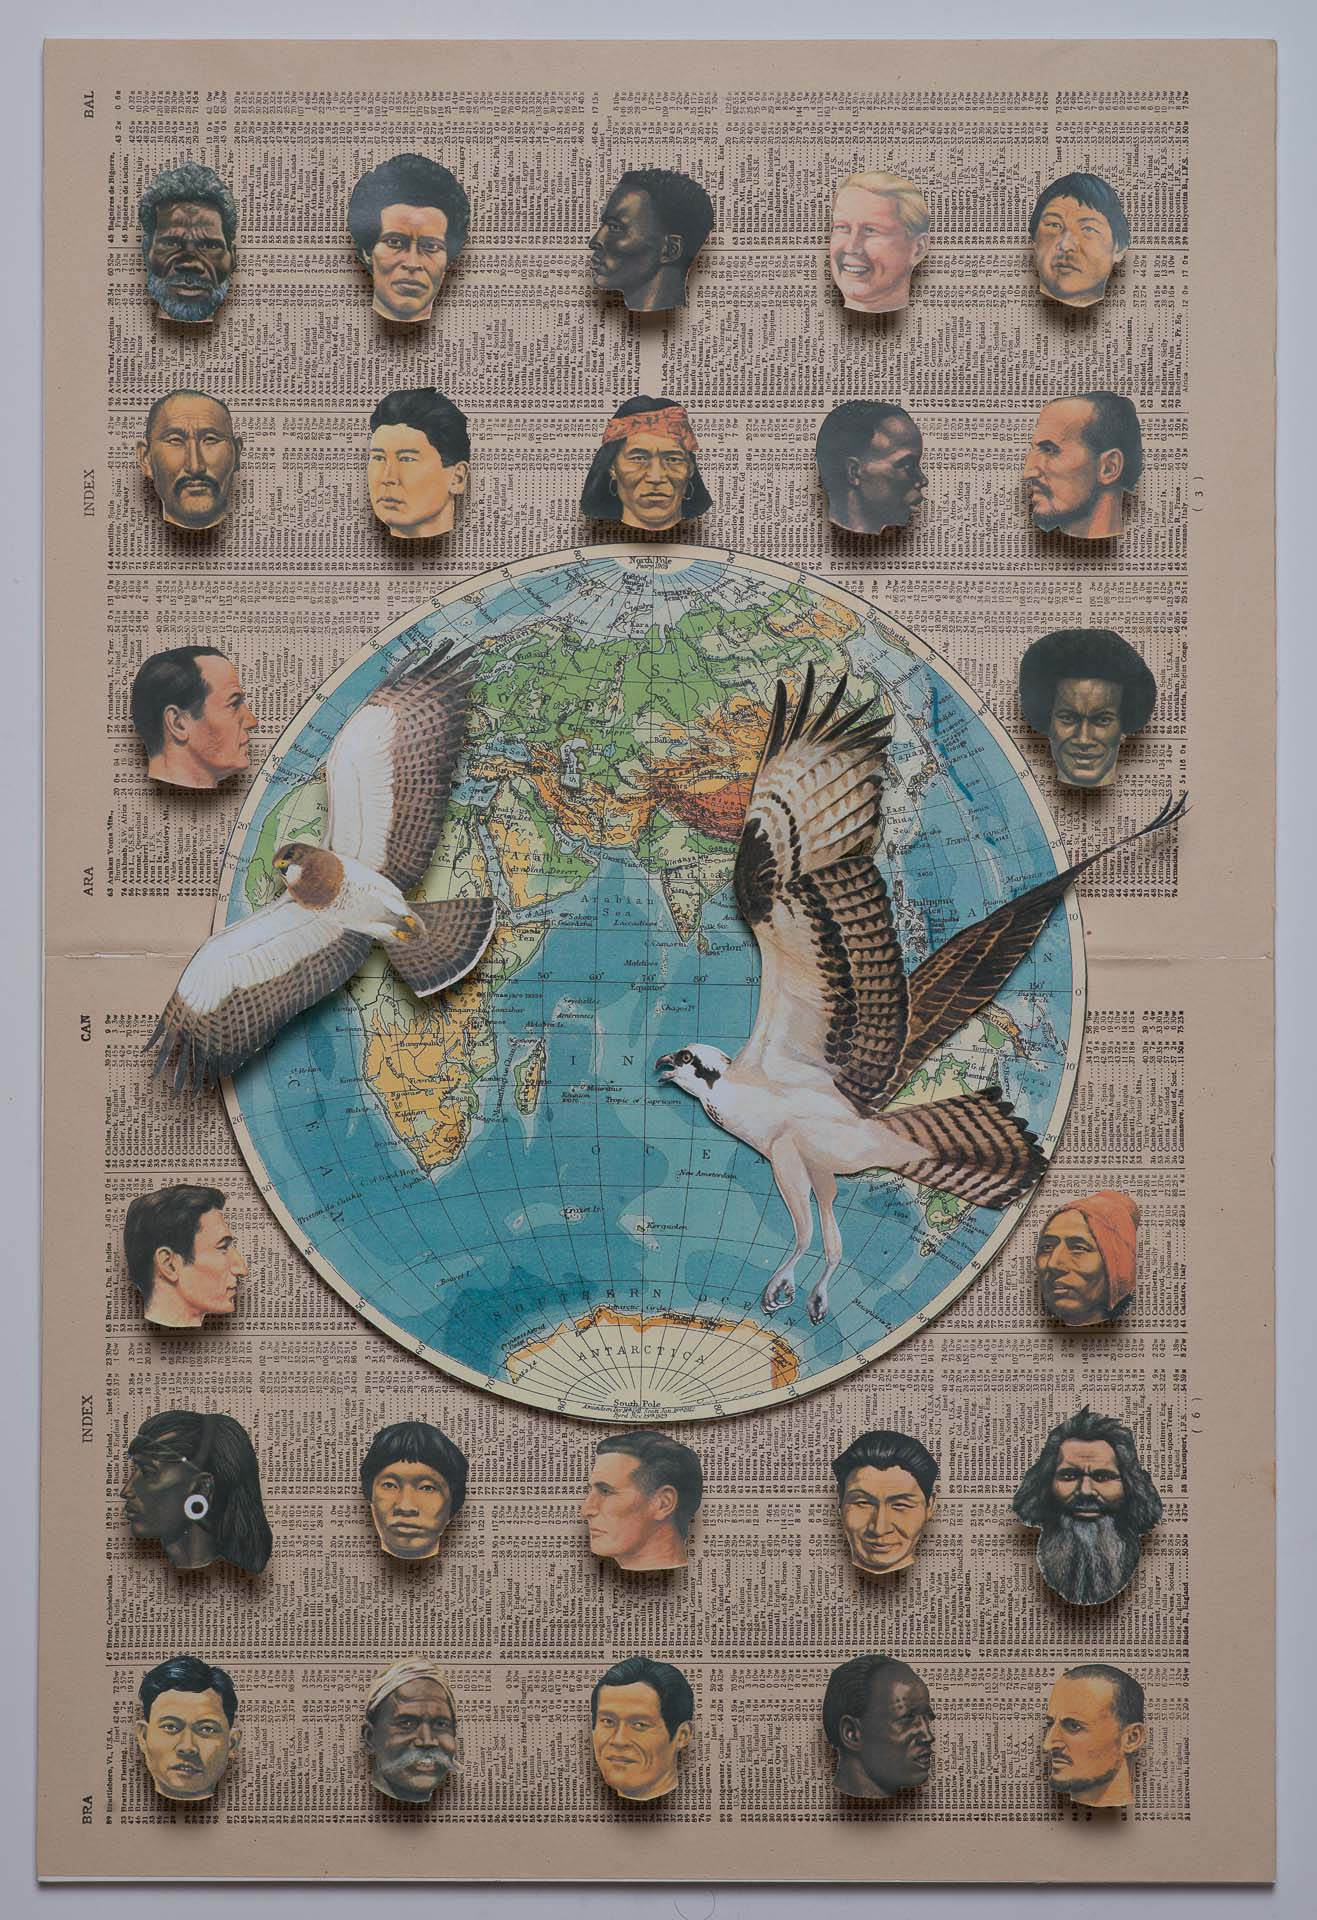 Heads & Birds